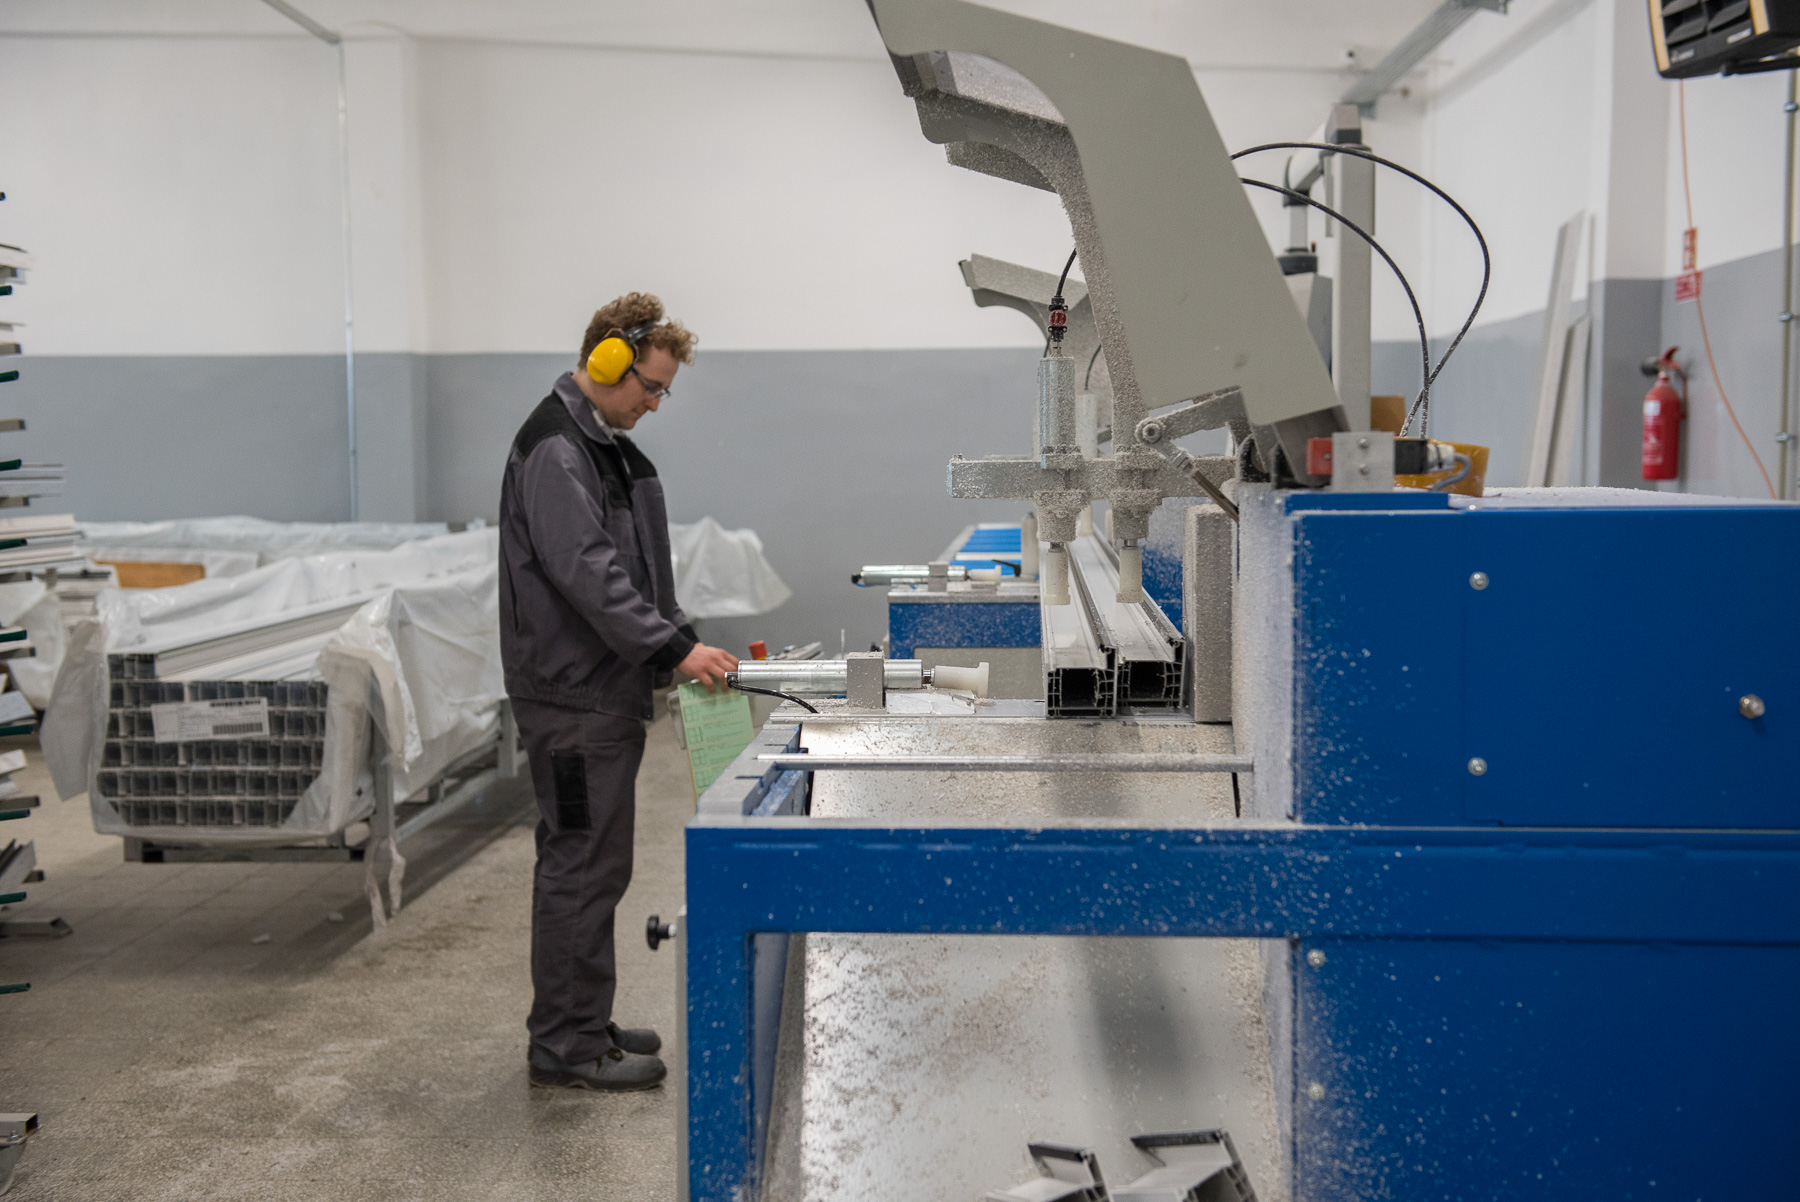 Fabryka połczyńska (14)